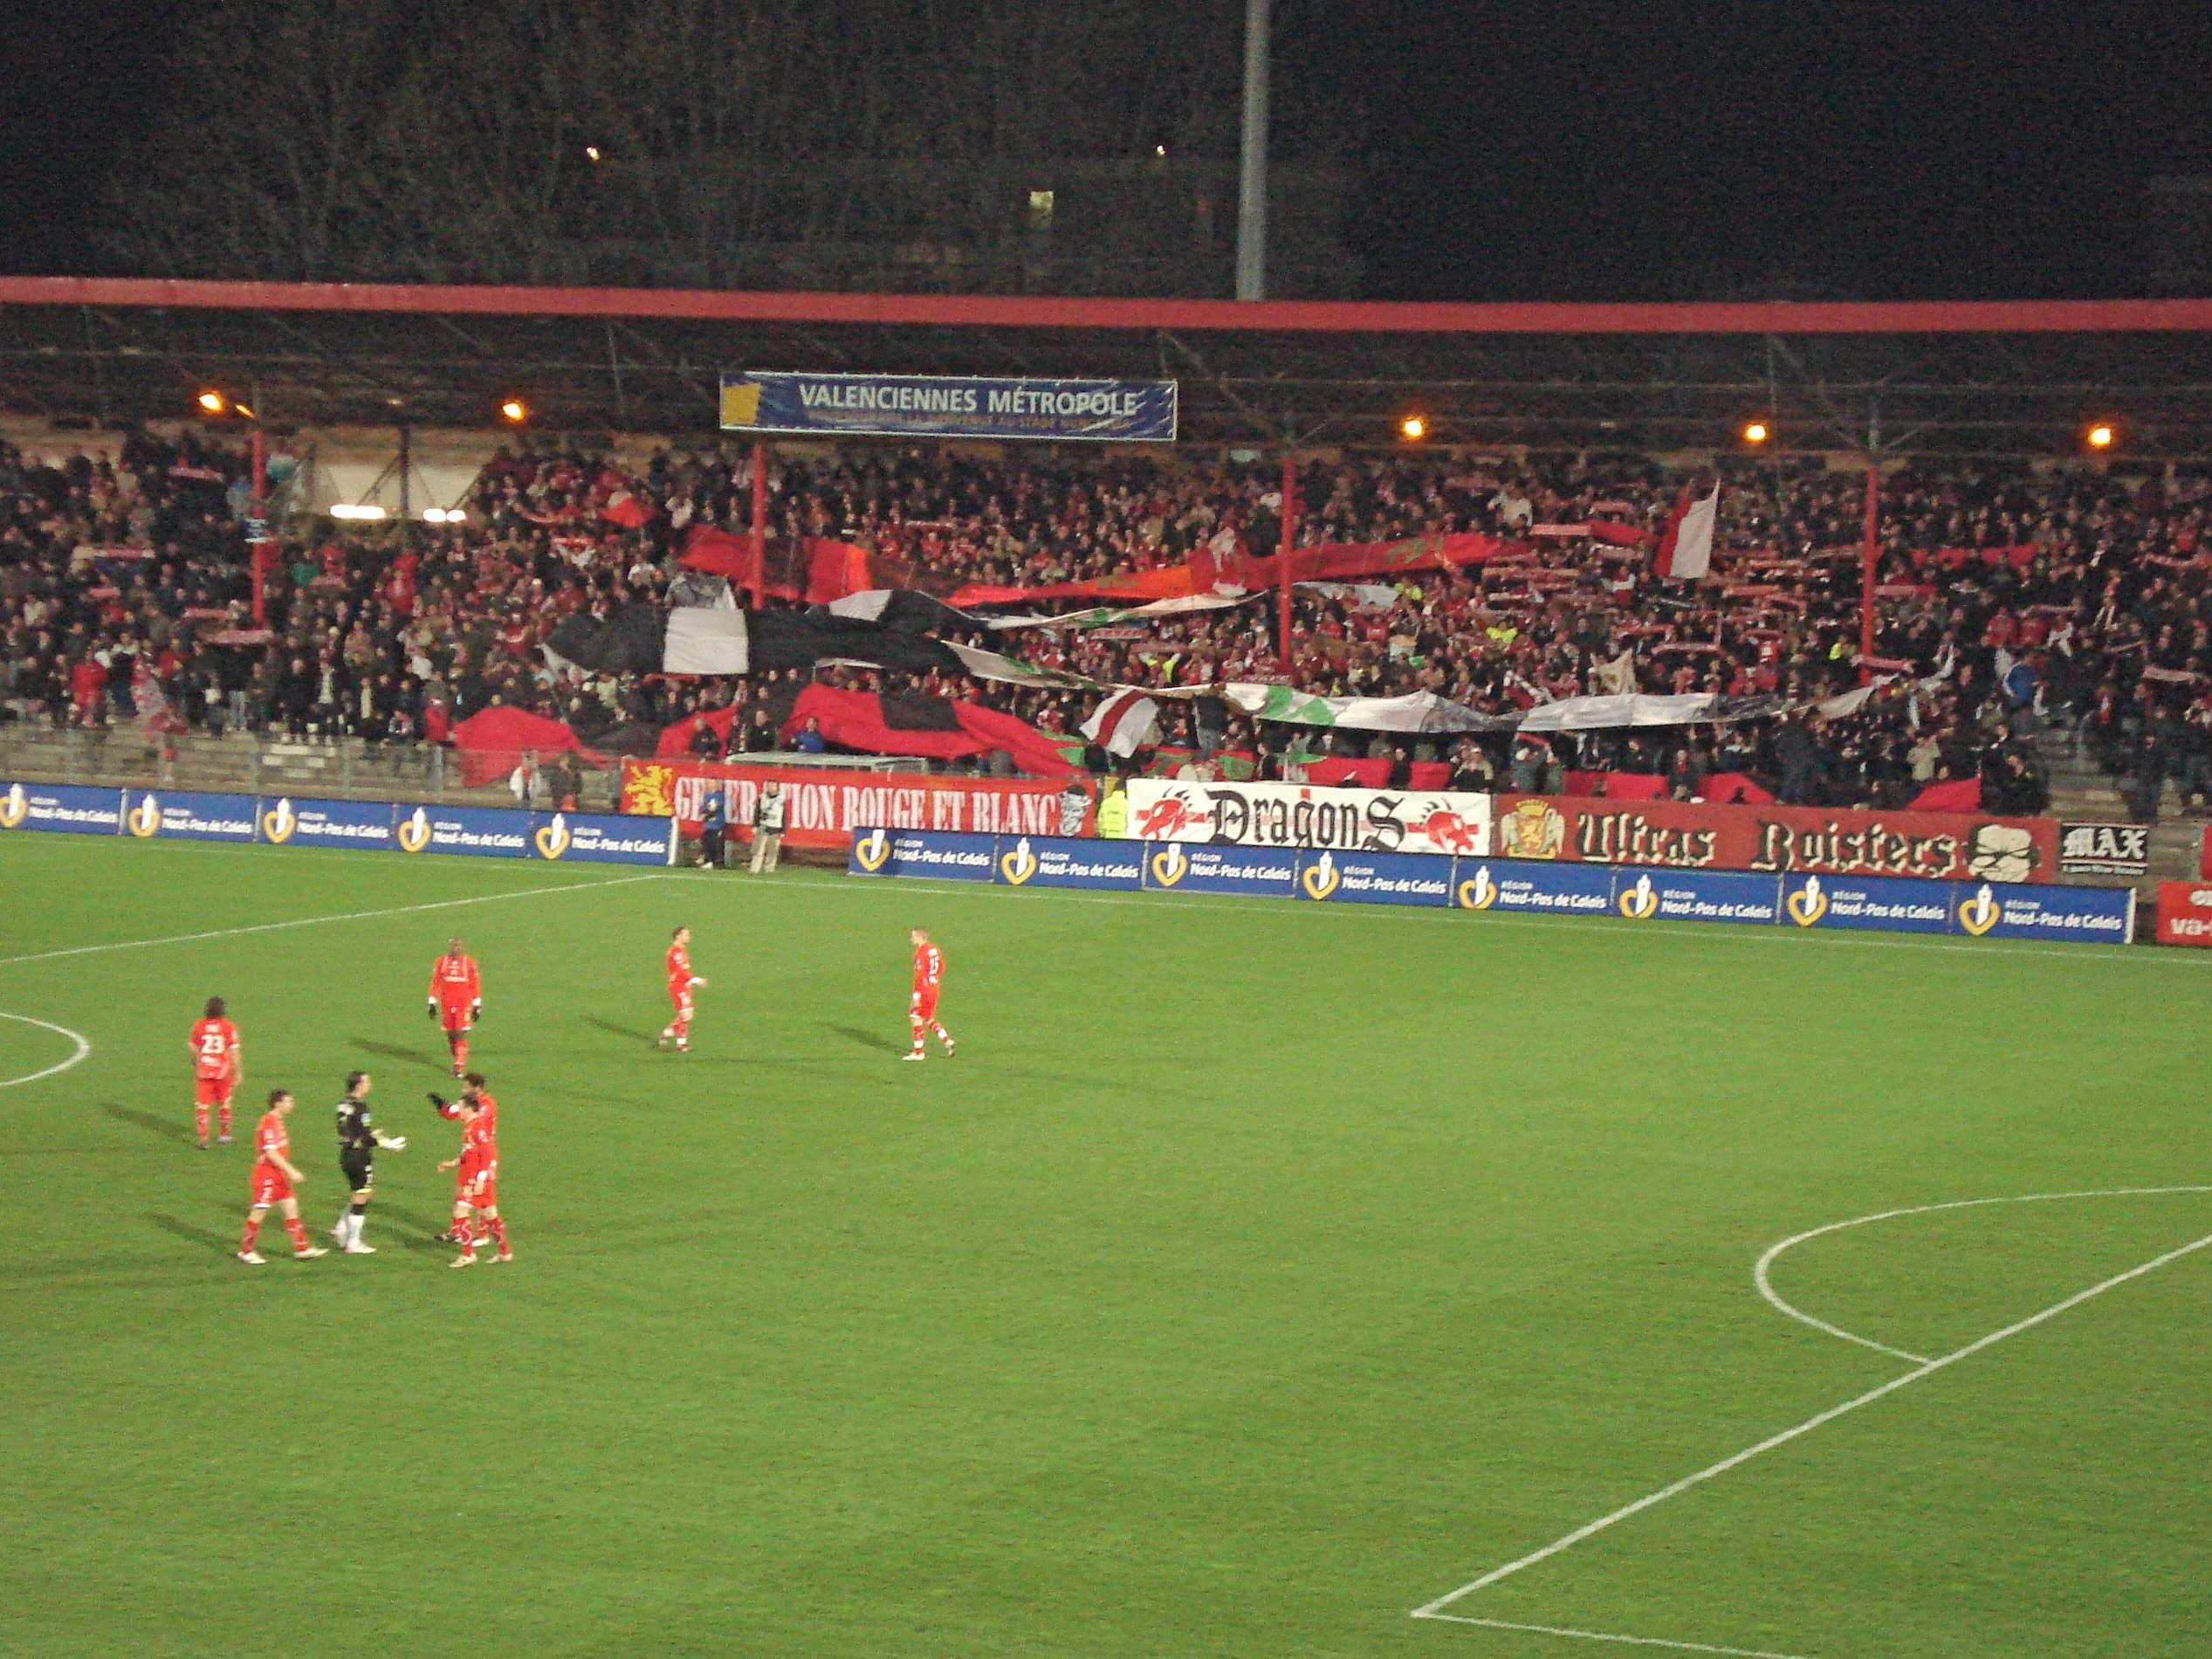 Derby_Valenciennes_VS_Lille_(Stade_Nunge